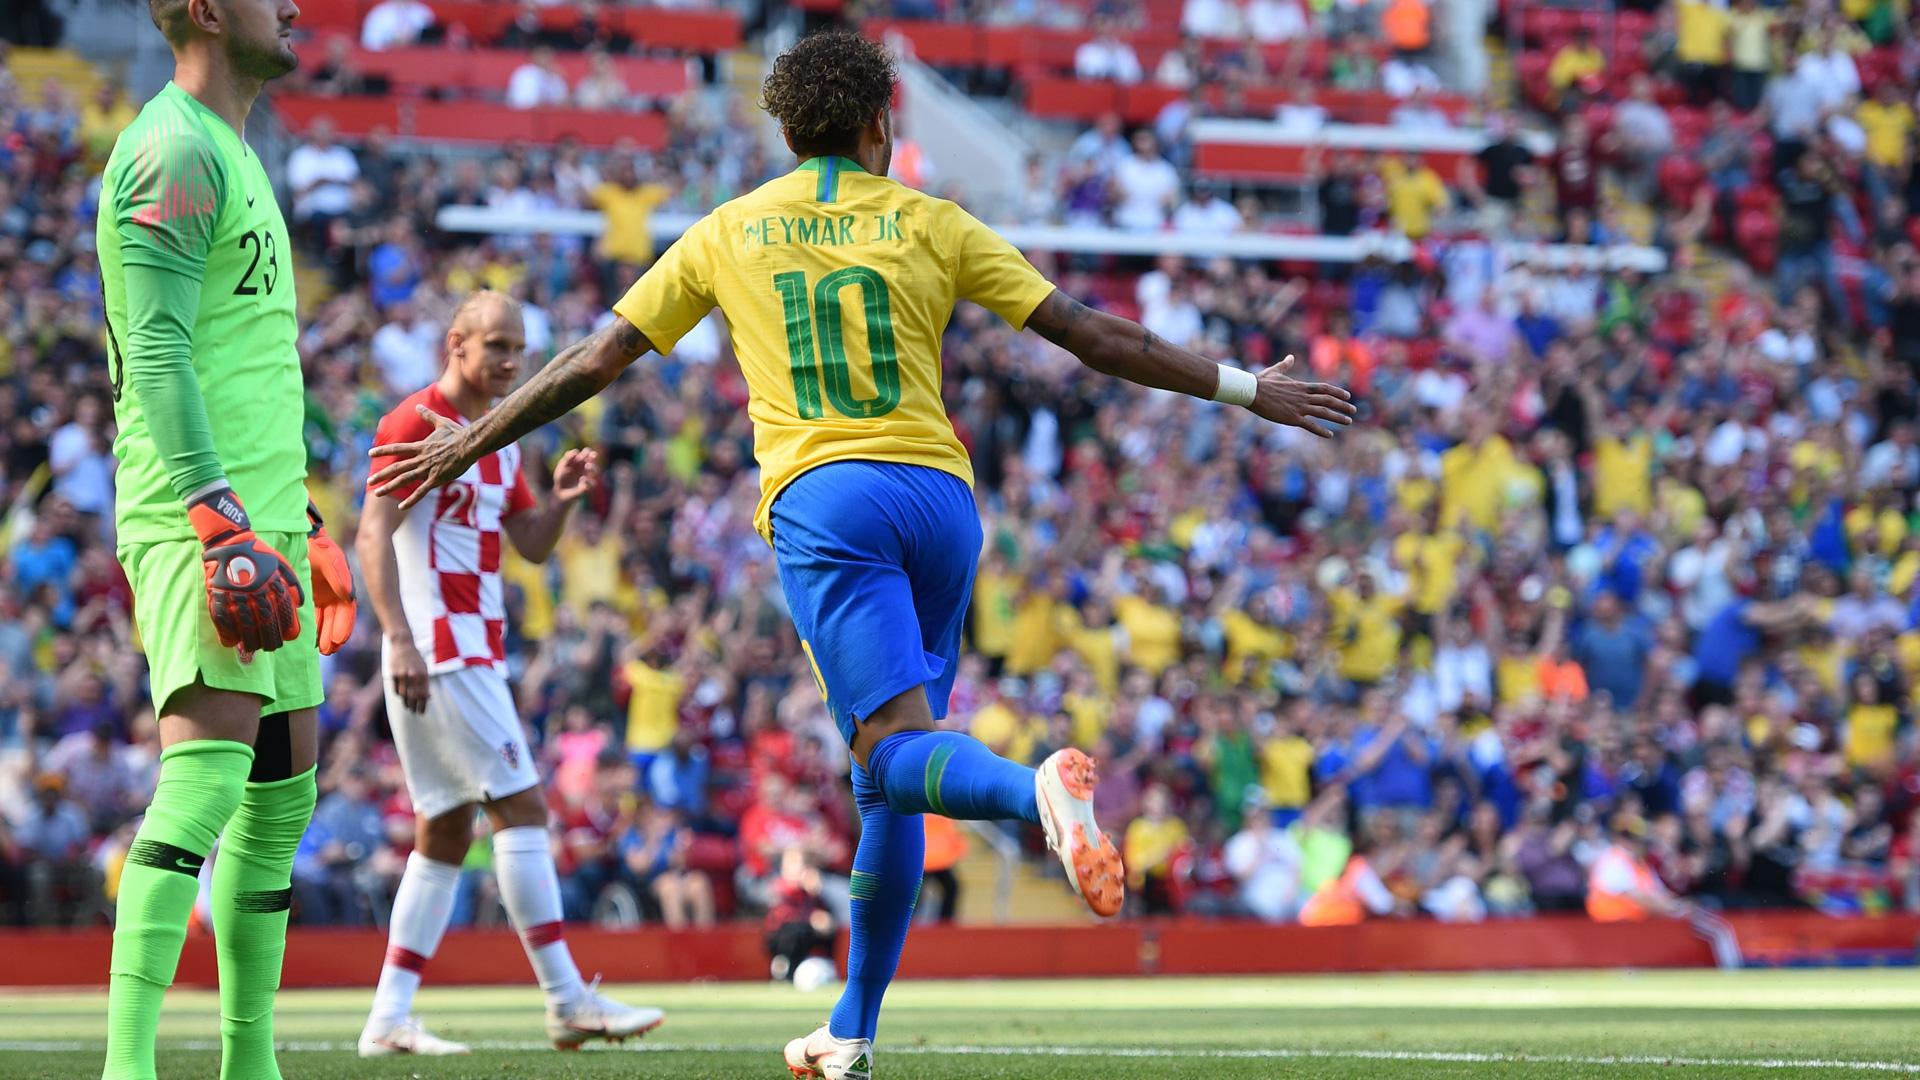 Neymar Brasilien Testspiel 03062018